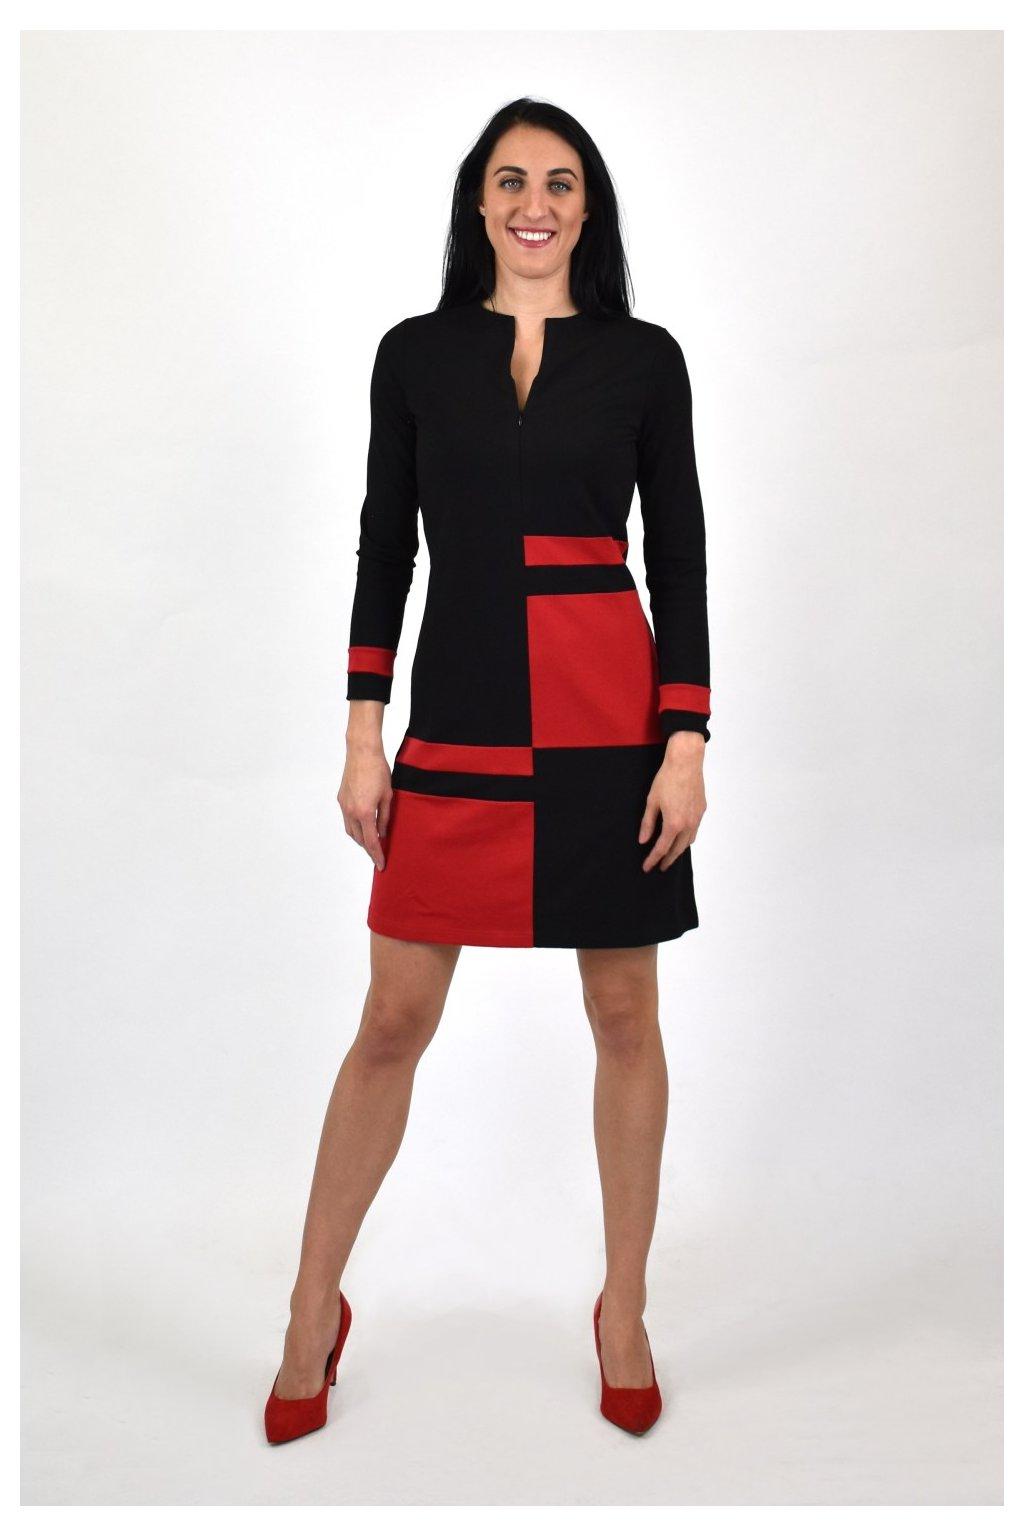 dámske červeno čierne šaty